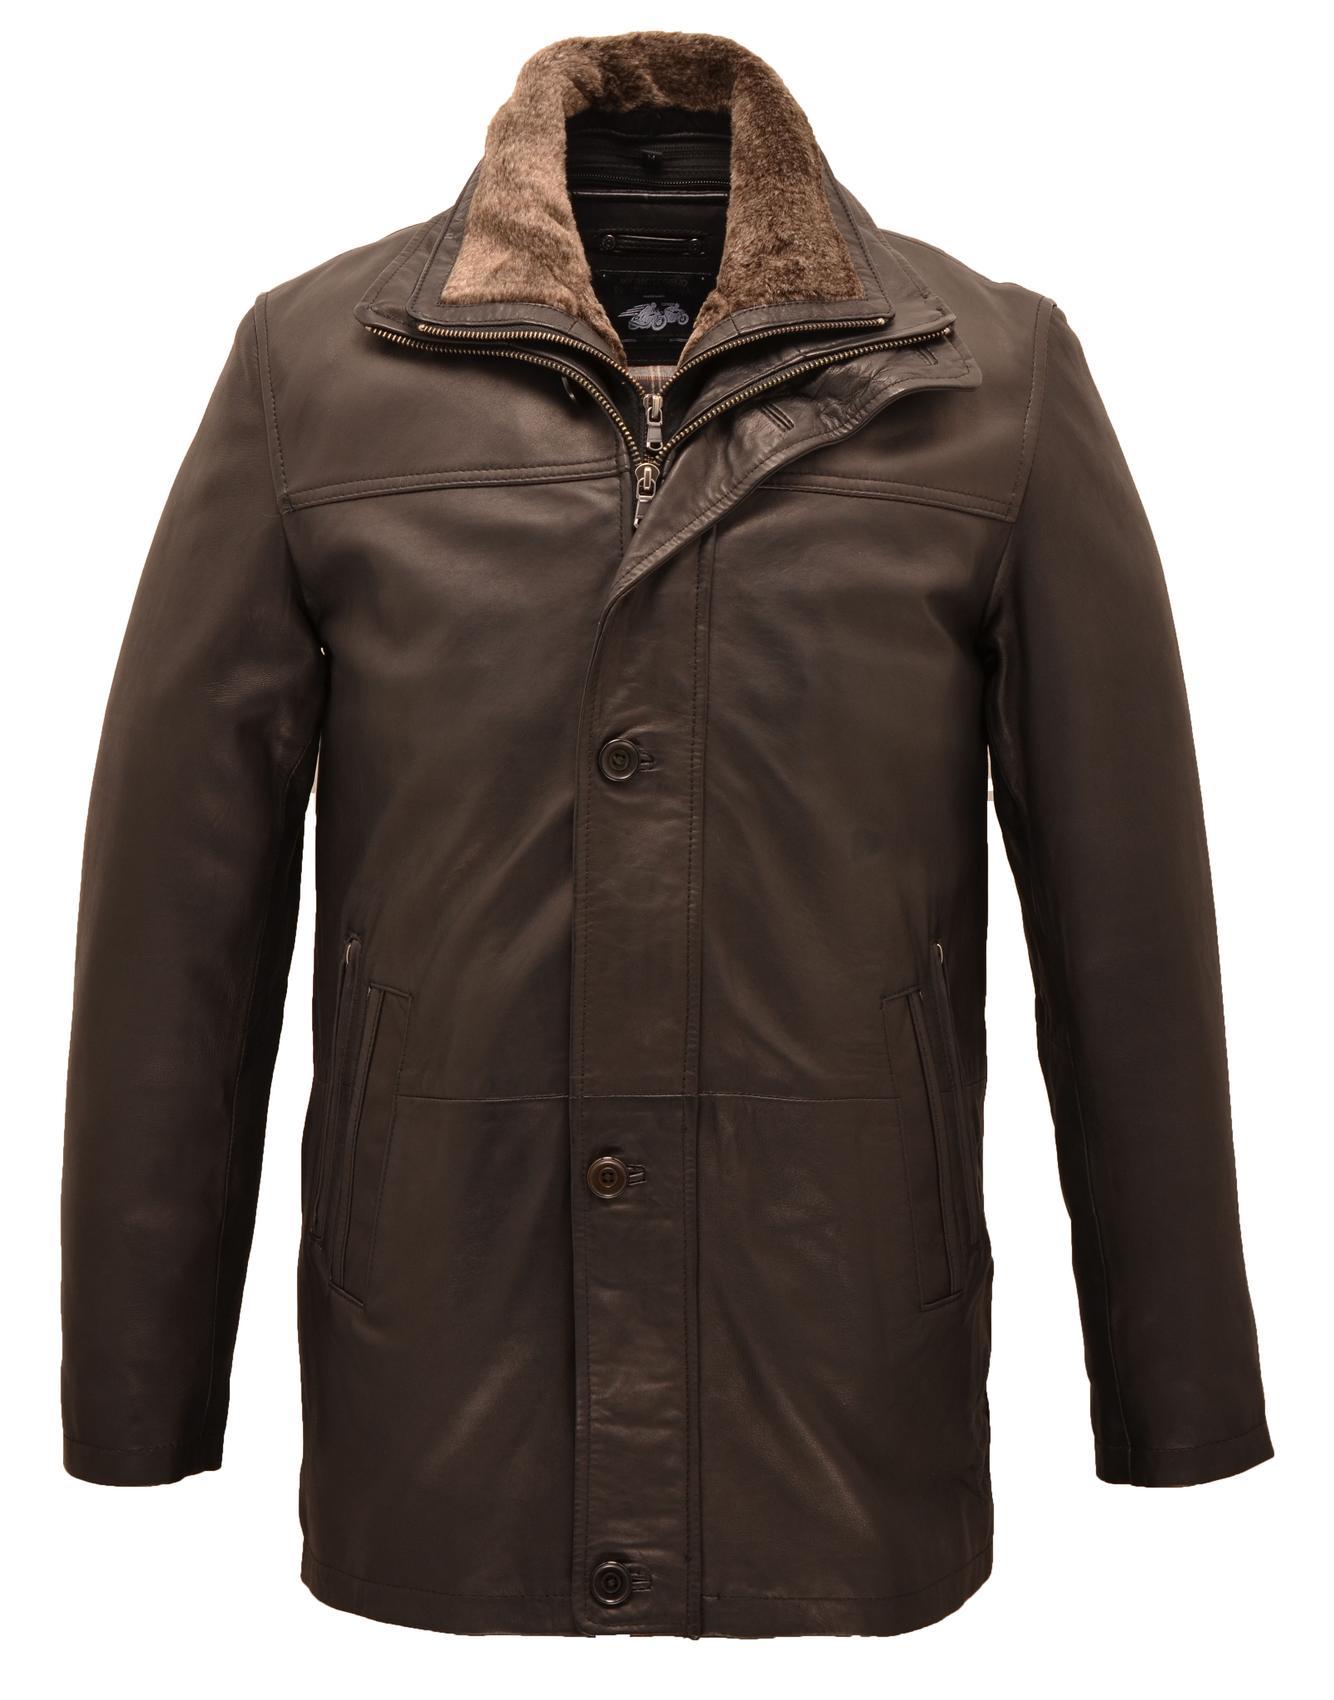 vetement cuir homme manteau cuir homme veste cuir. Black Bedroom Furniture Sets. Home Design Ideas